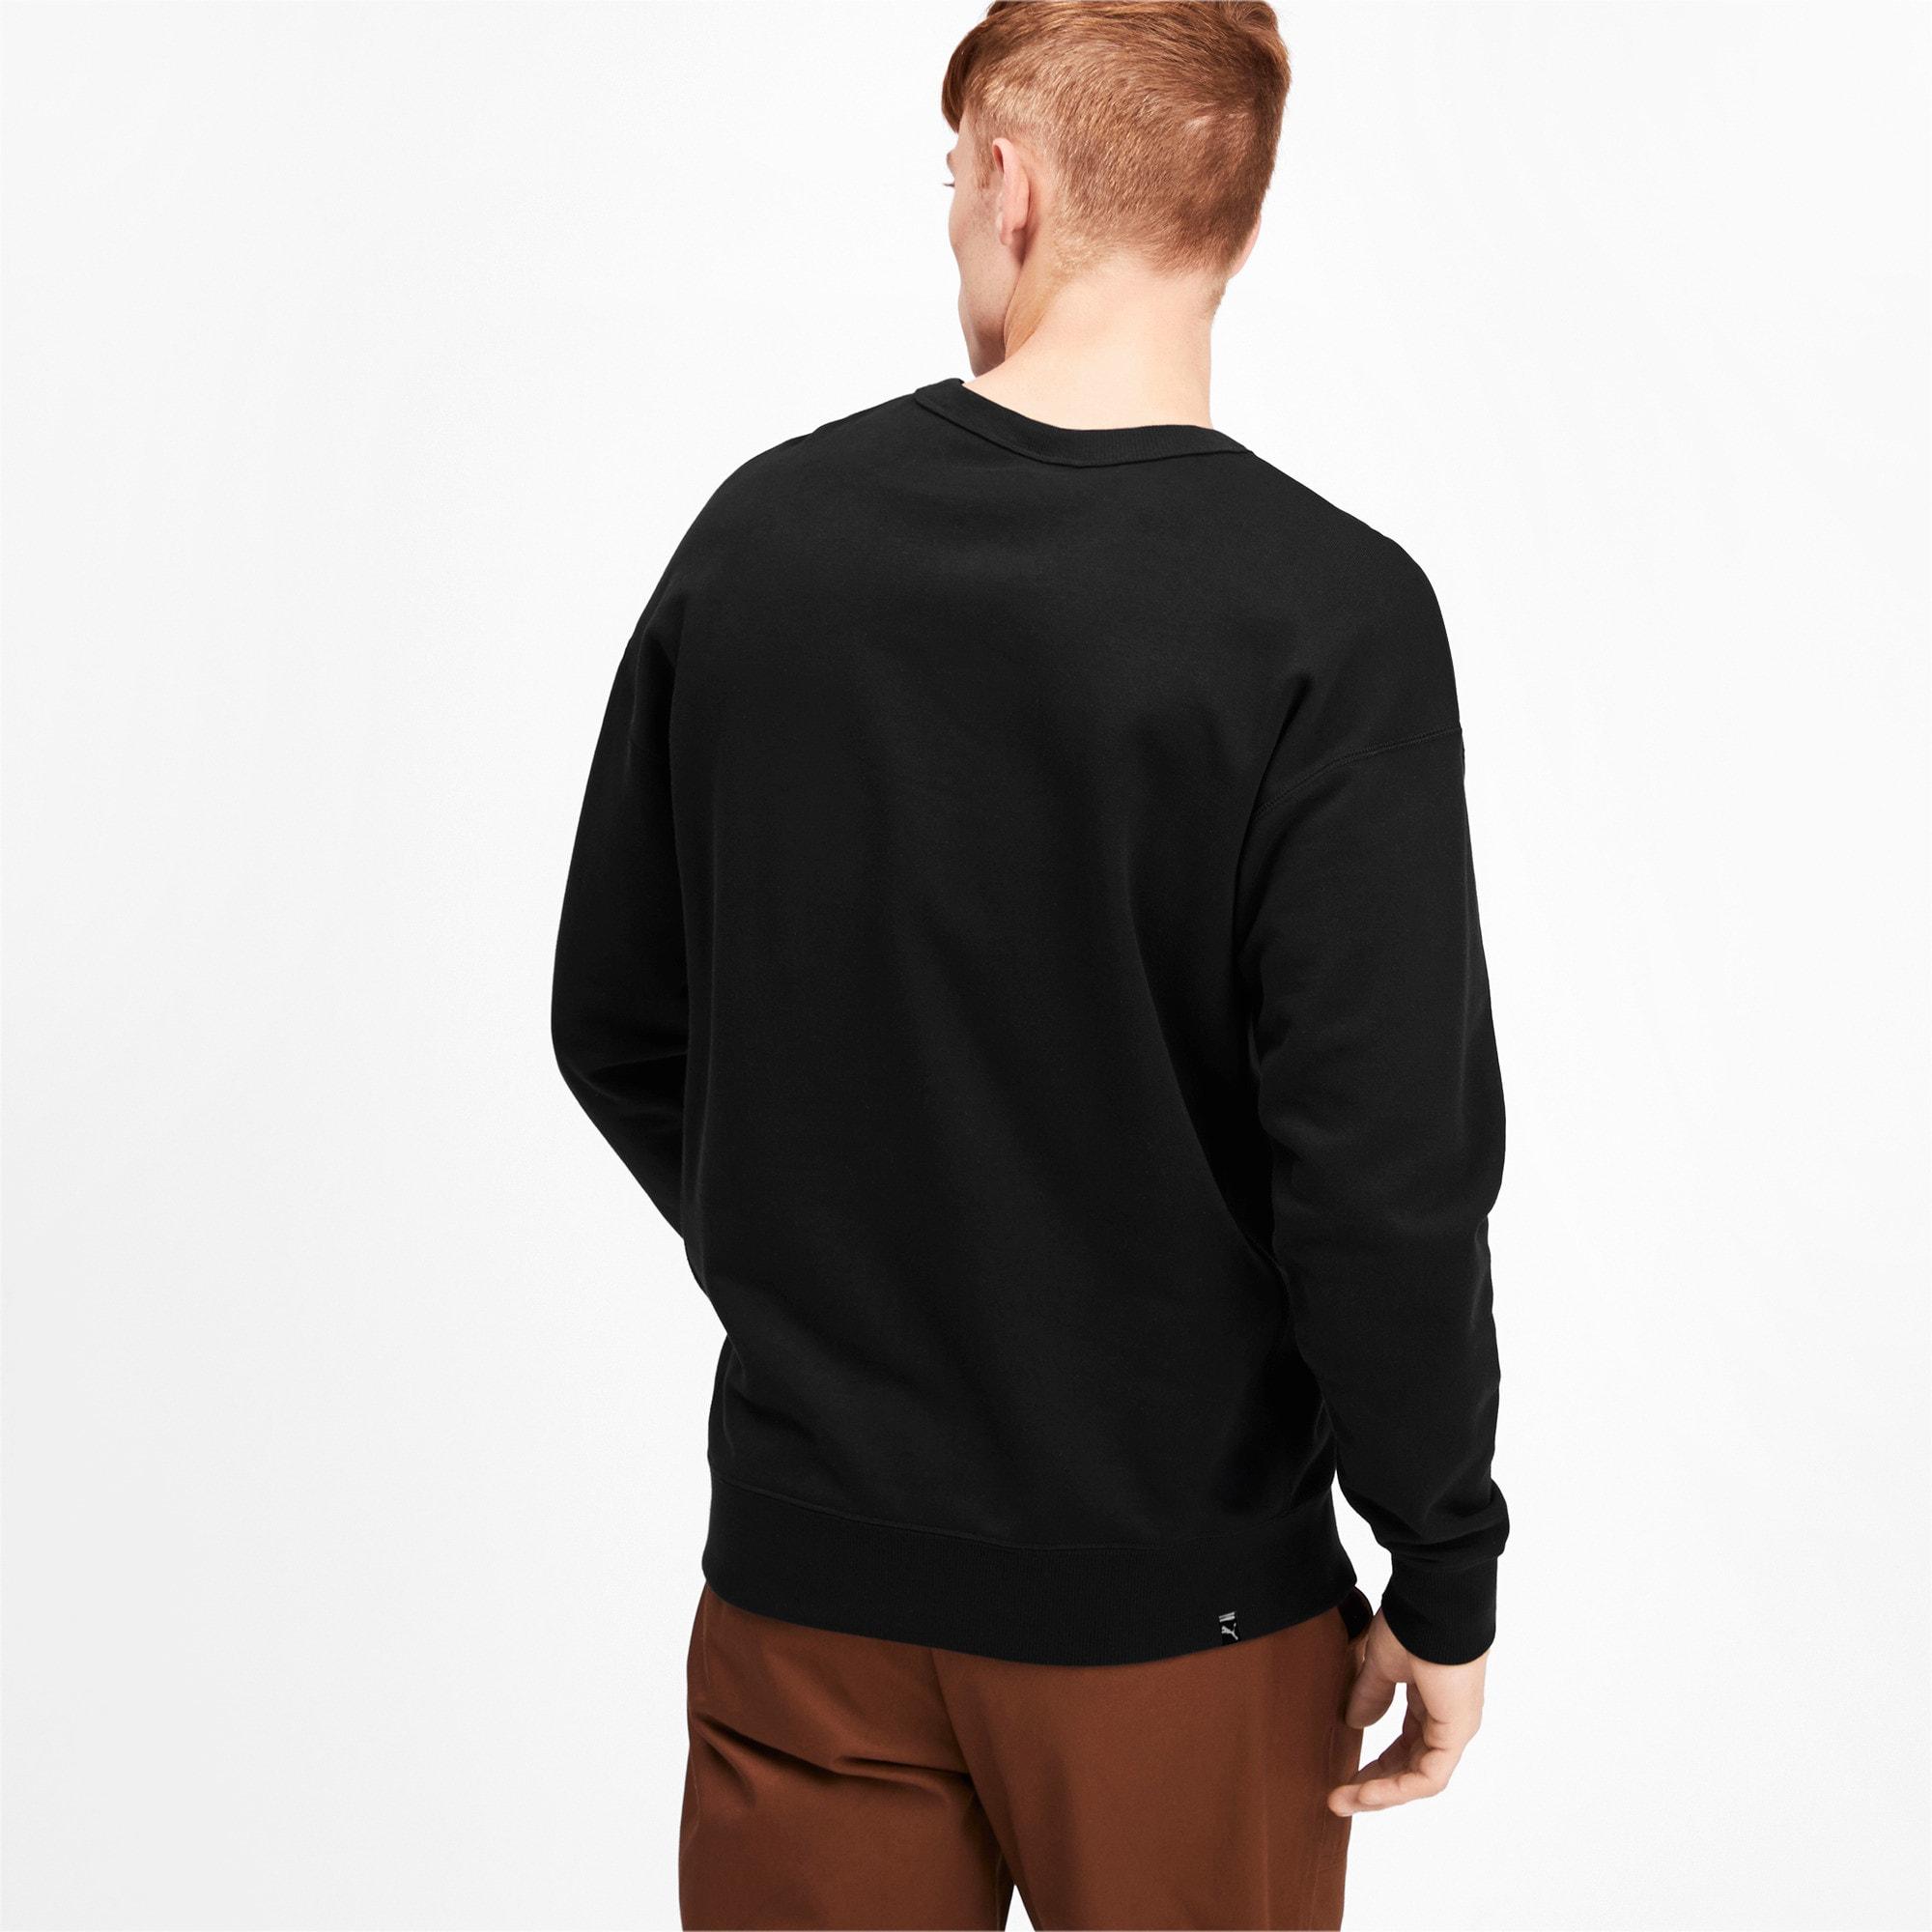 Thumbnail 3 of Downtown Men's Crewneck Sweatshirt, Puma Black, medium